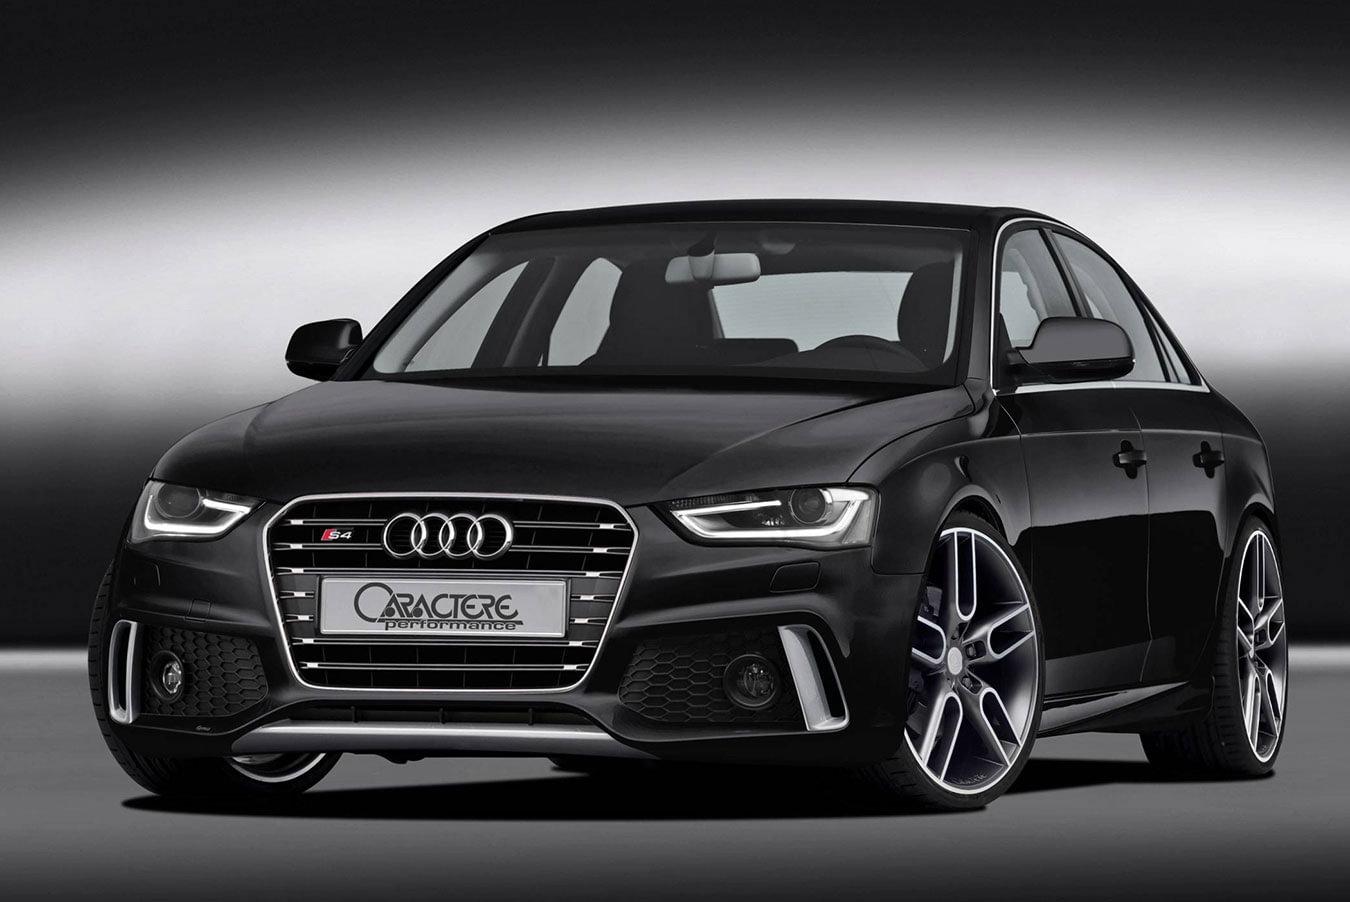 Audi S4 B8.5 (2013-2016)